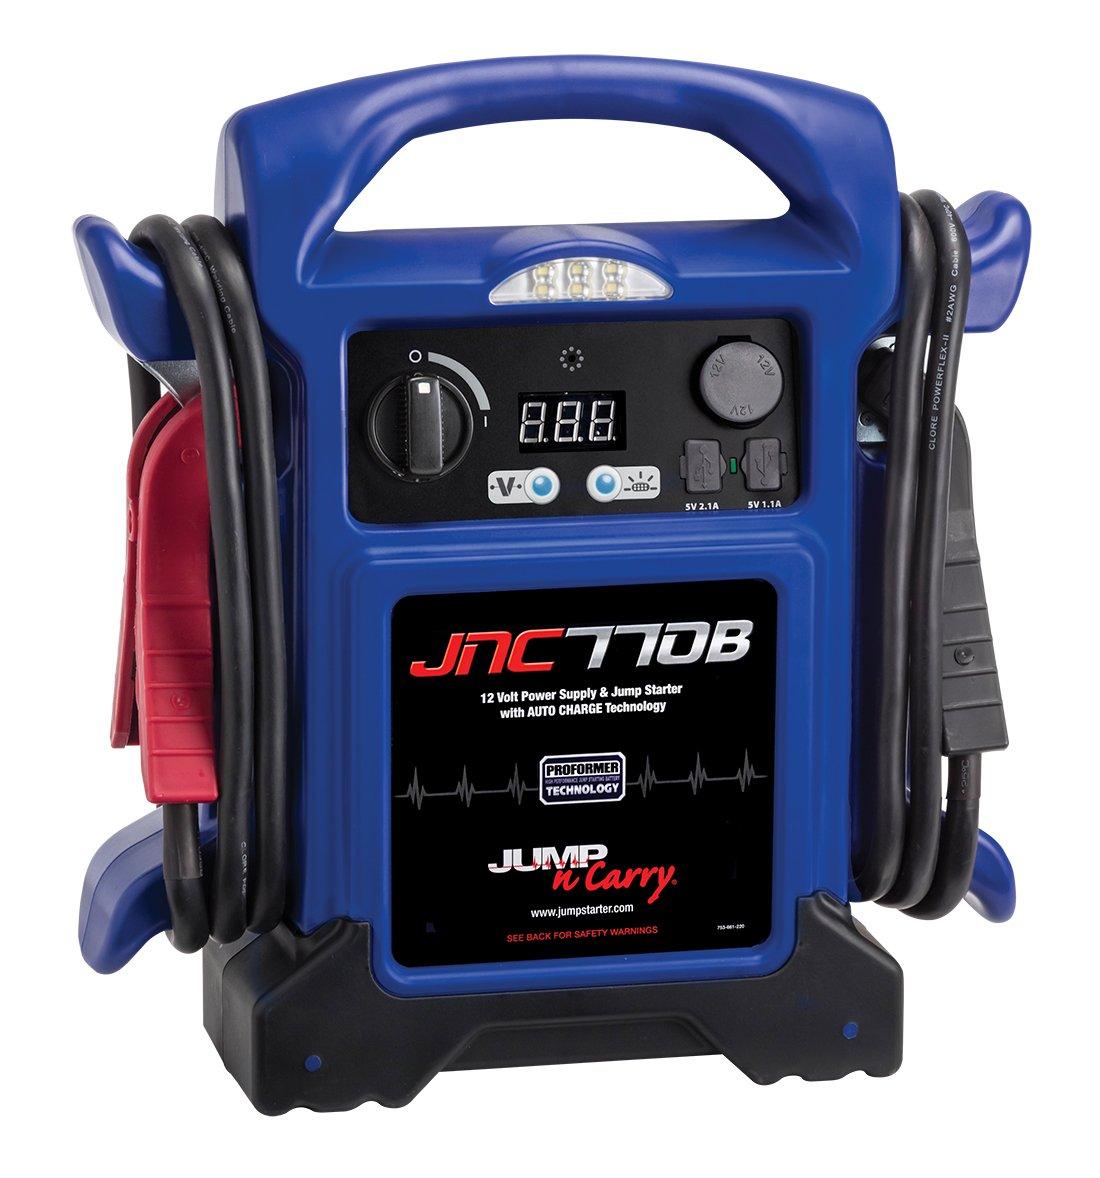 Jump-N-Carry JNC770B 1700 Peak Amp Premium 12V Jump Starter - Blue by Clore Automotive